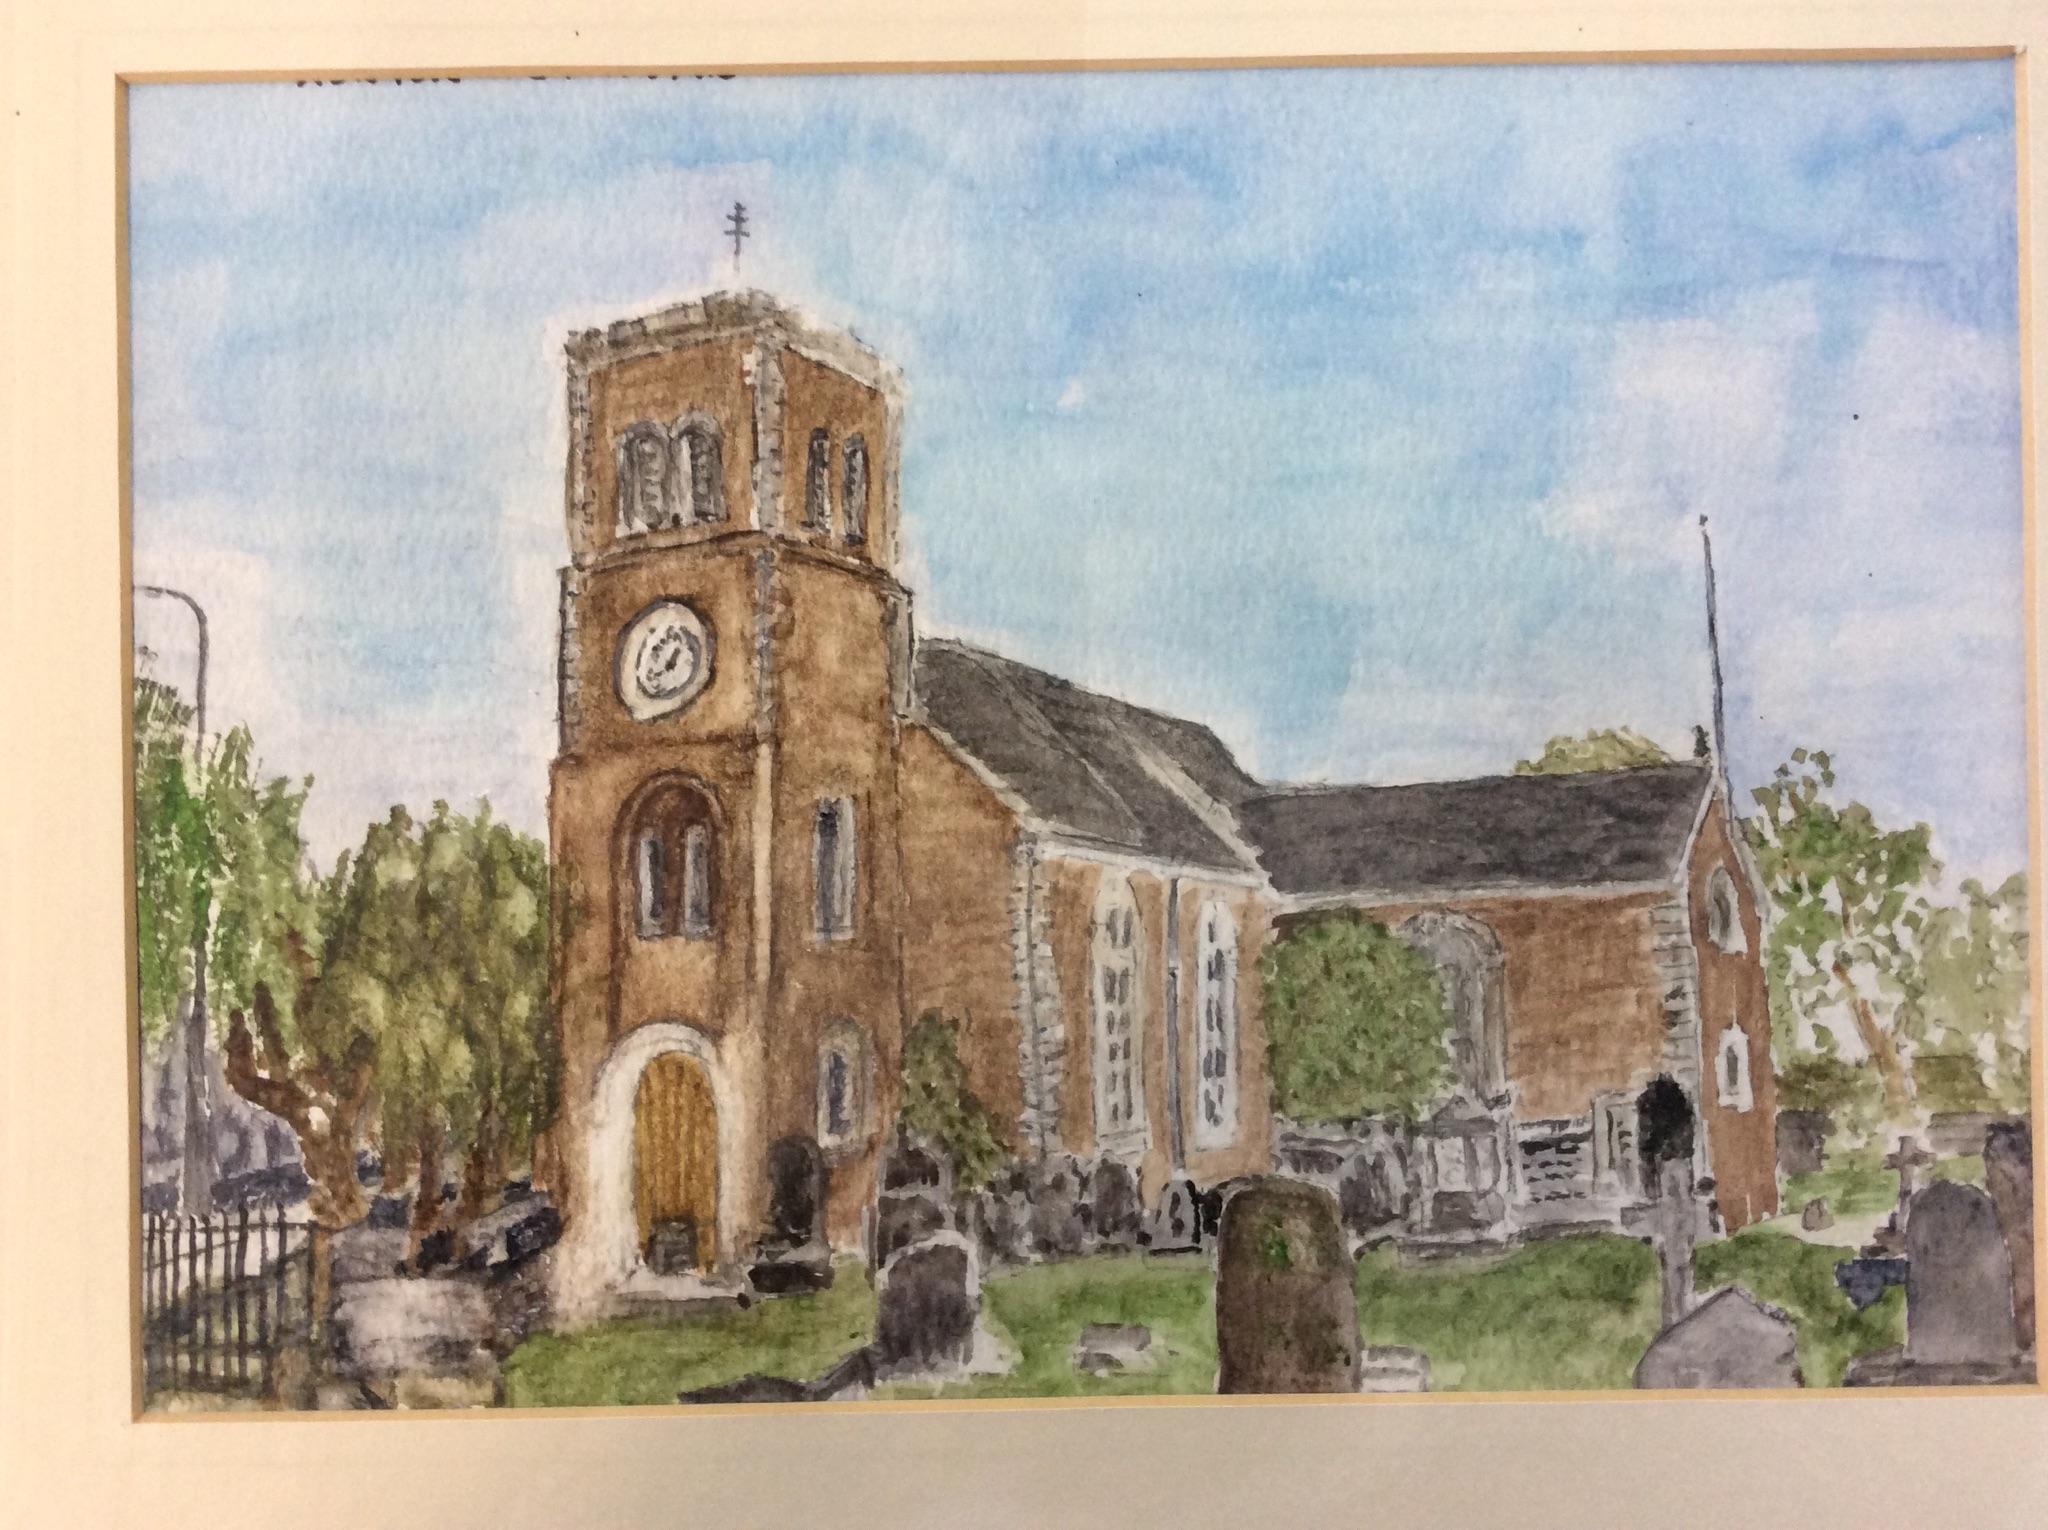 Lowton St Mary's Church